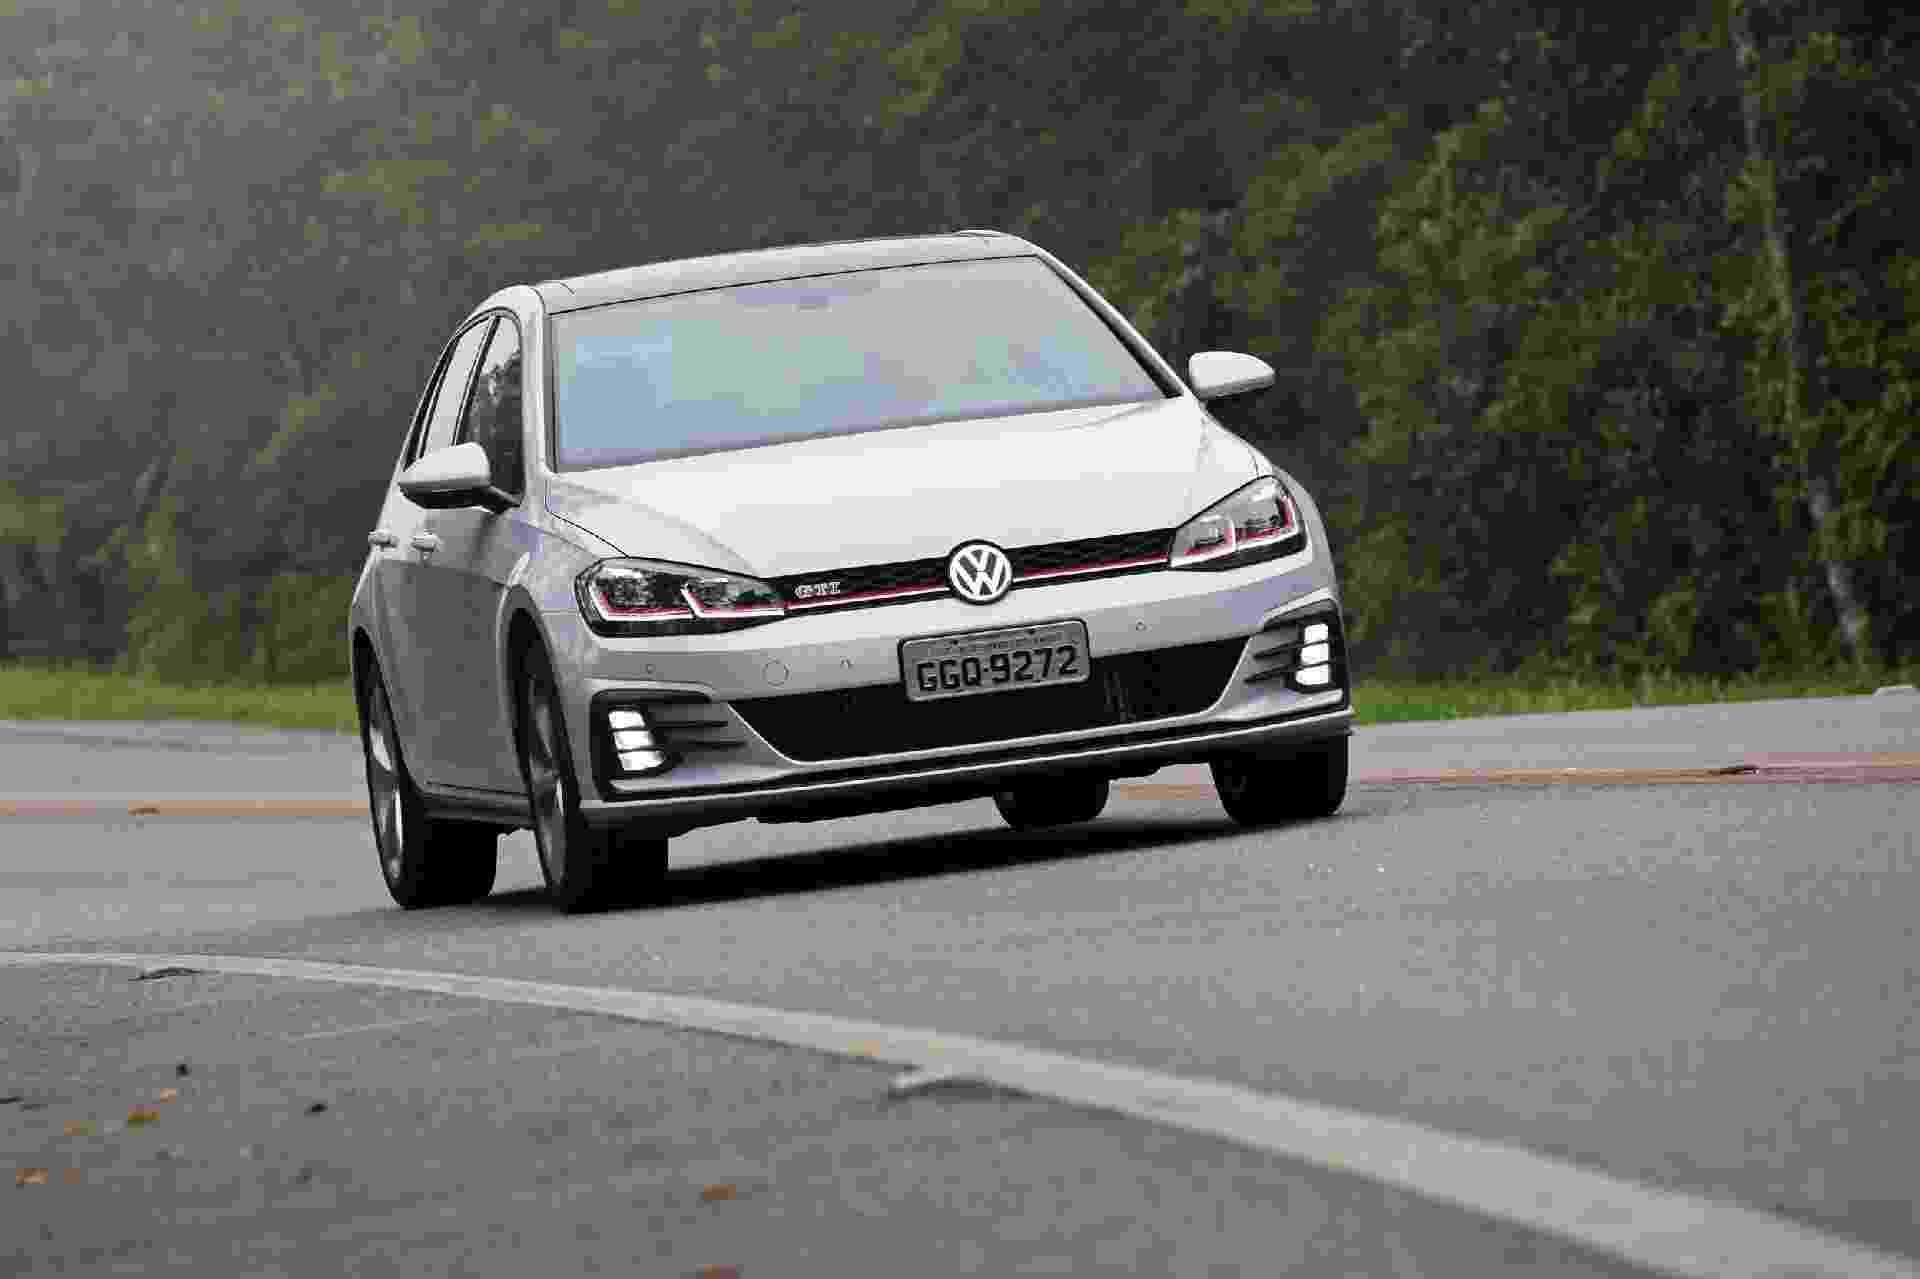 Volkswagen Golf GTI 2018 - Murilo Góes/UOL